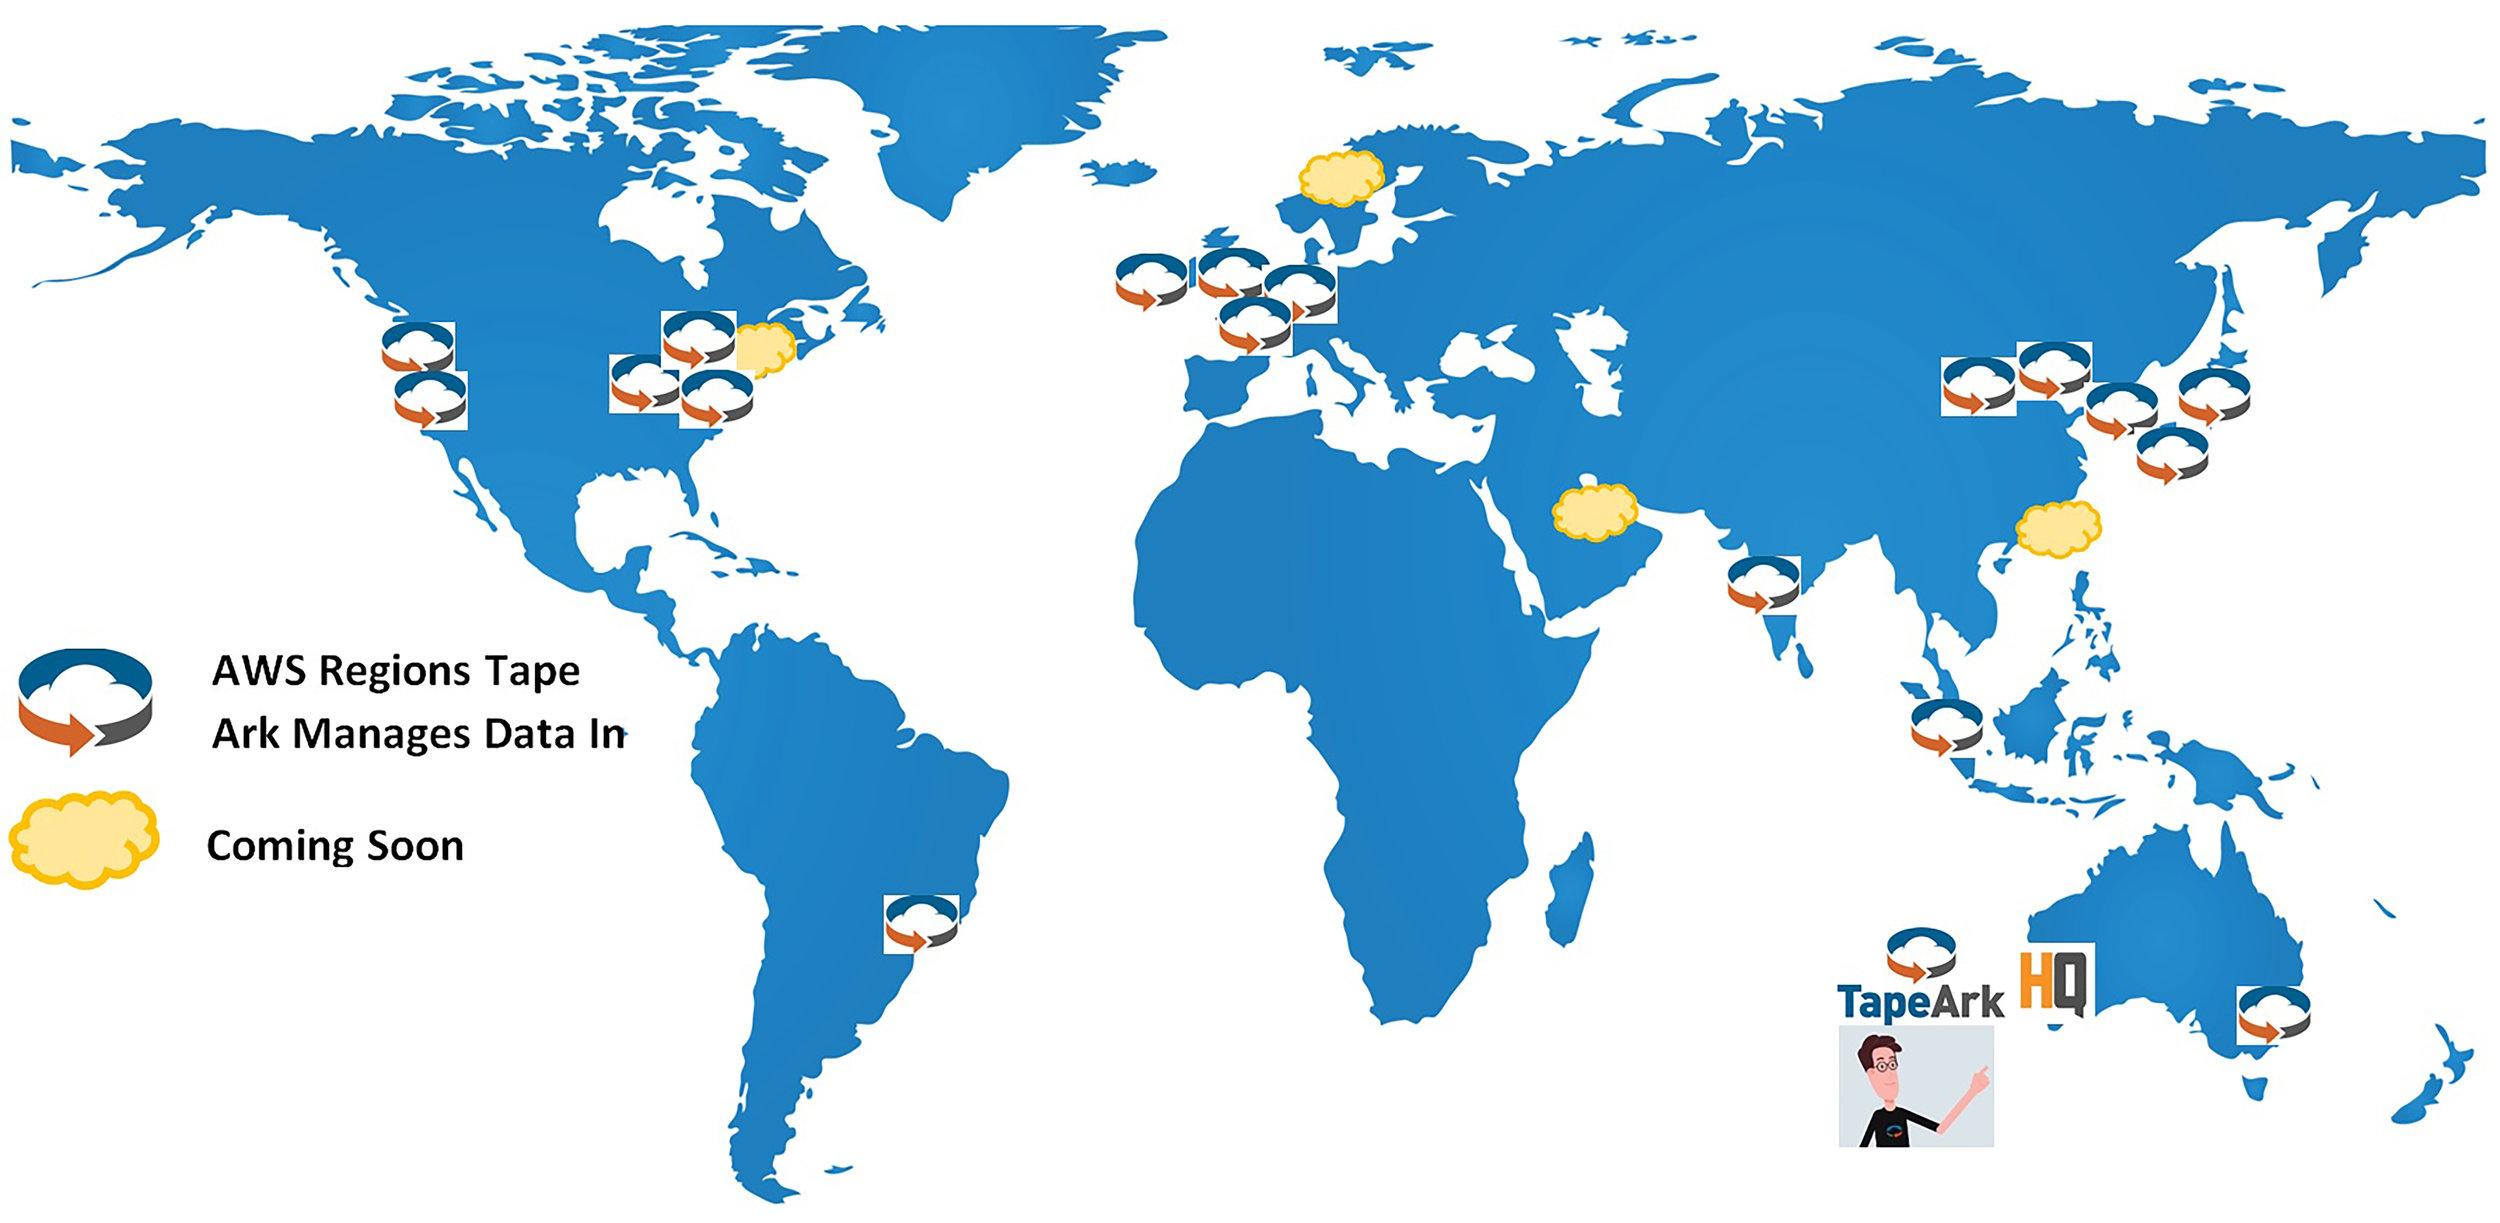 World Map - AWS Regions Tape Ark Manages Data In_TEST.jpg